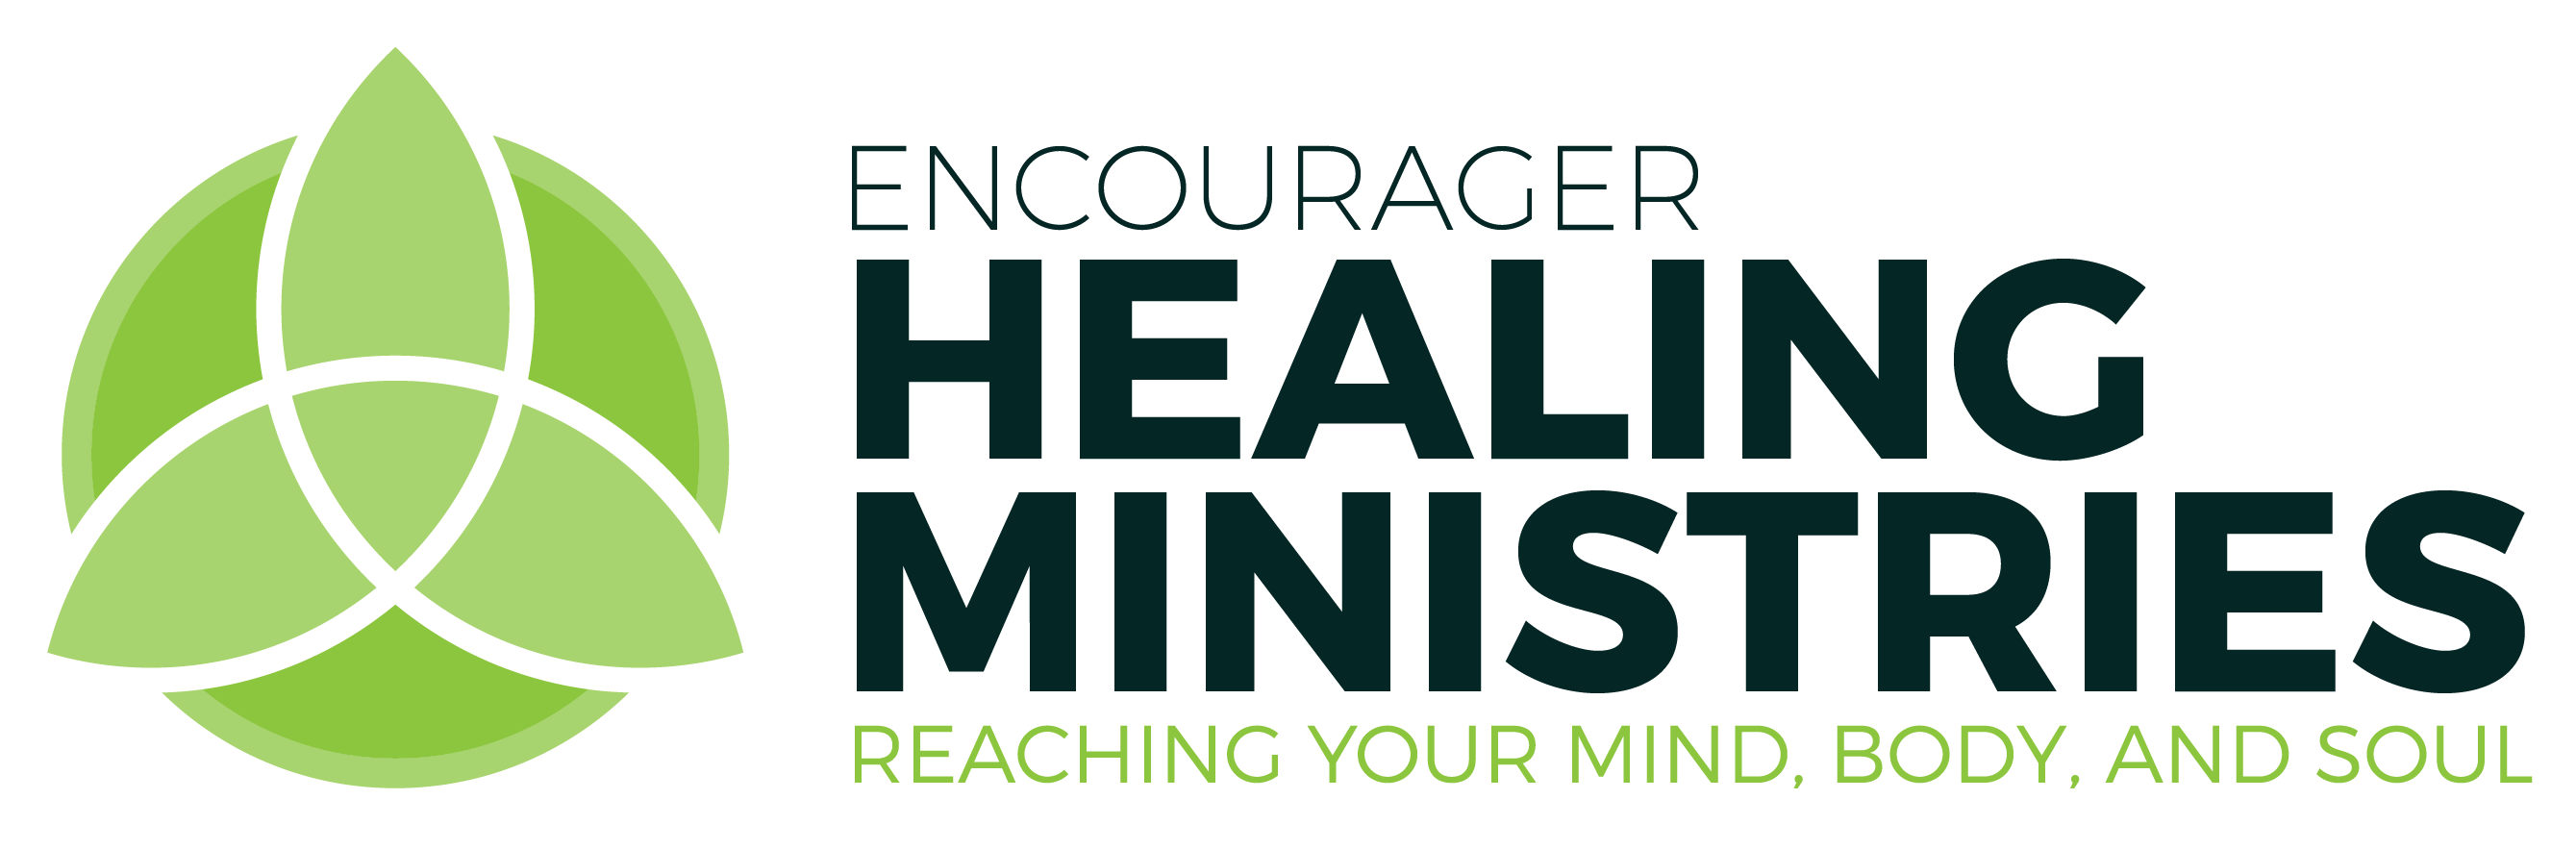 Healing Ministries - Encourager Church